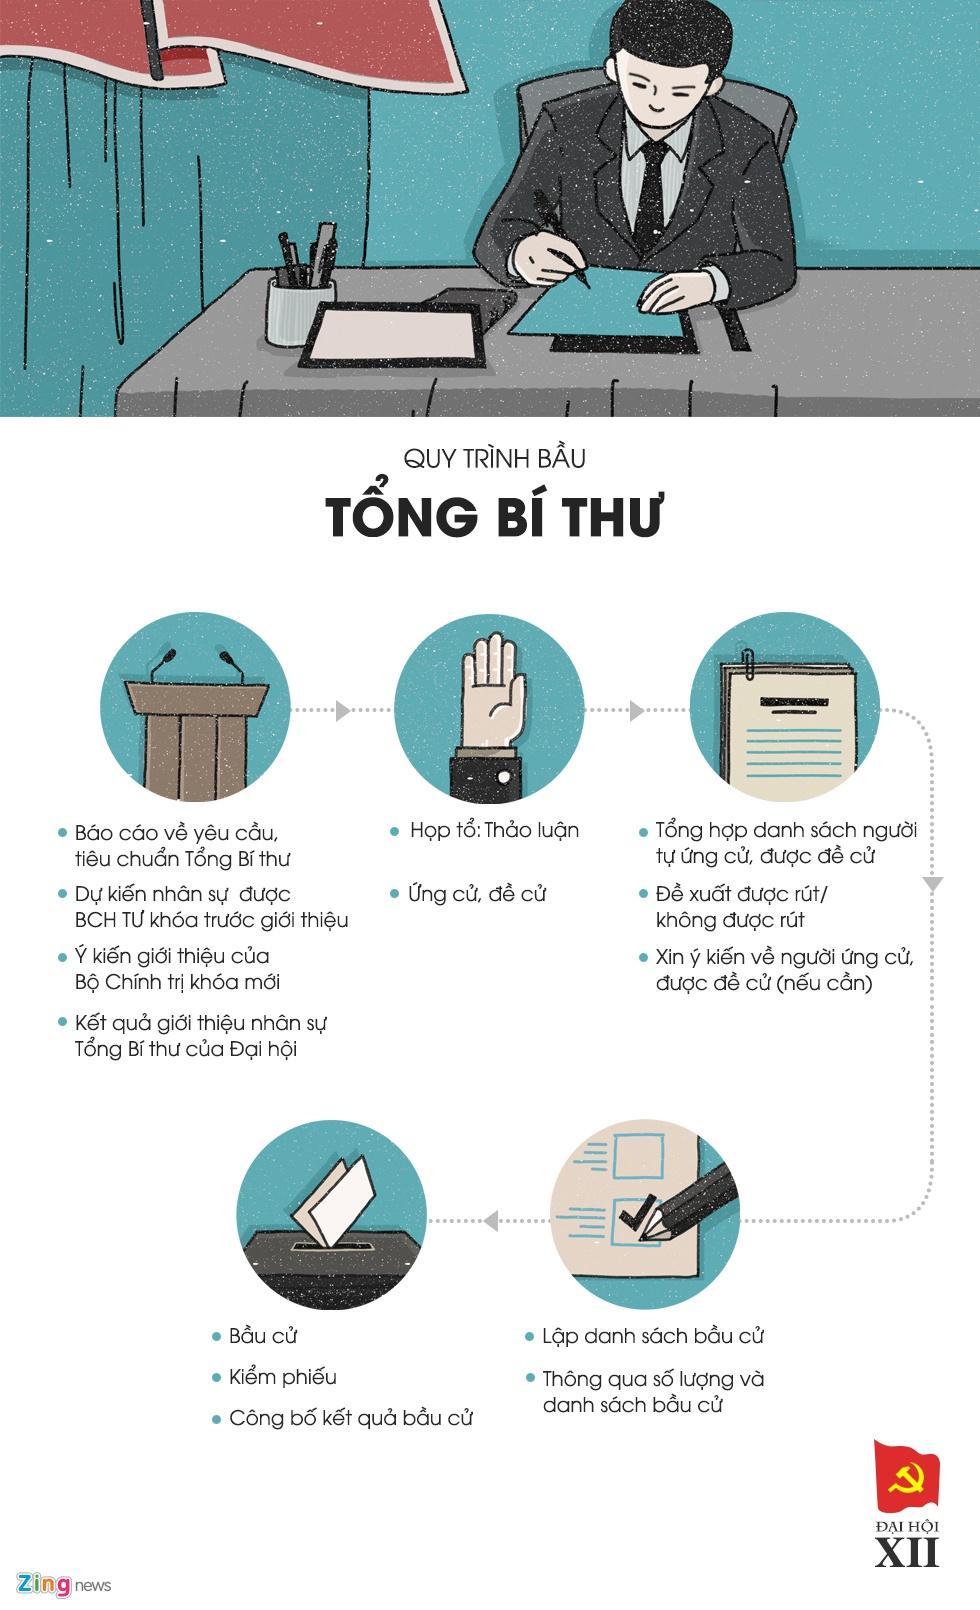 Bo Chinh tri, Tong bi thu Dang duoc bau the nao? hinh anh 3